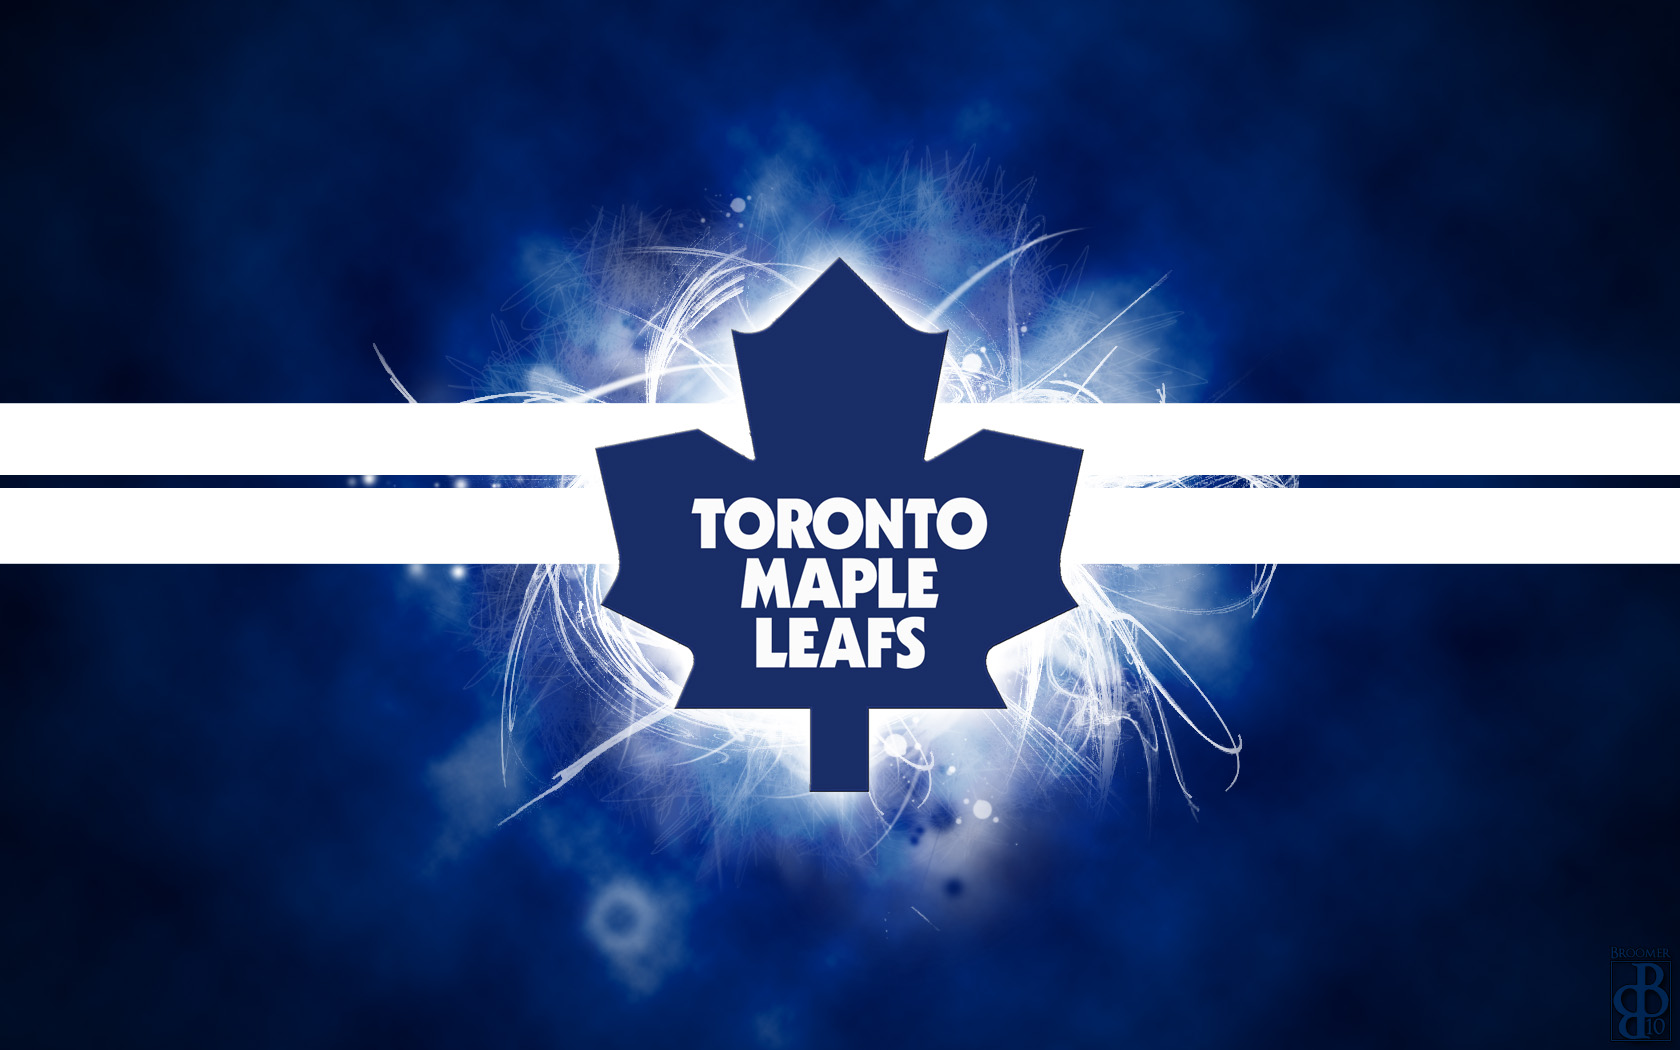 Toronto Maple Leafs By Bbboz On Deviantart